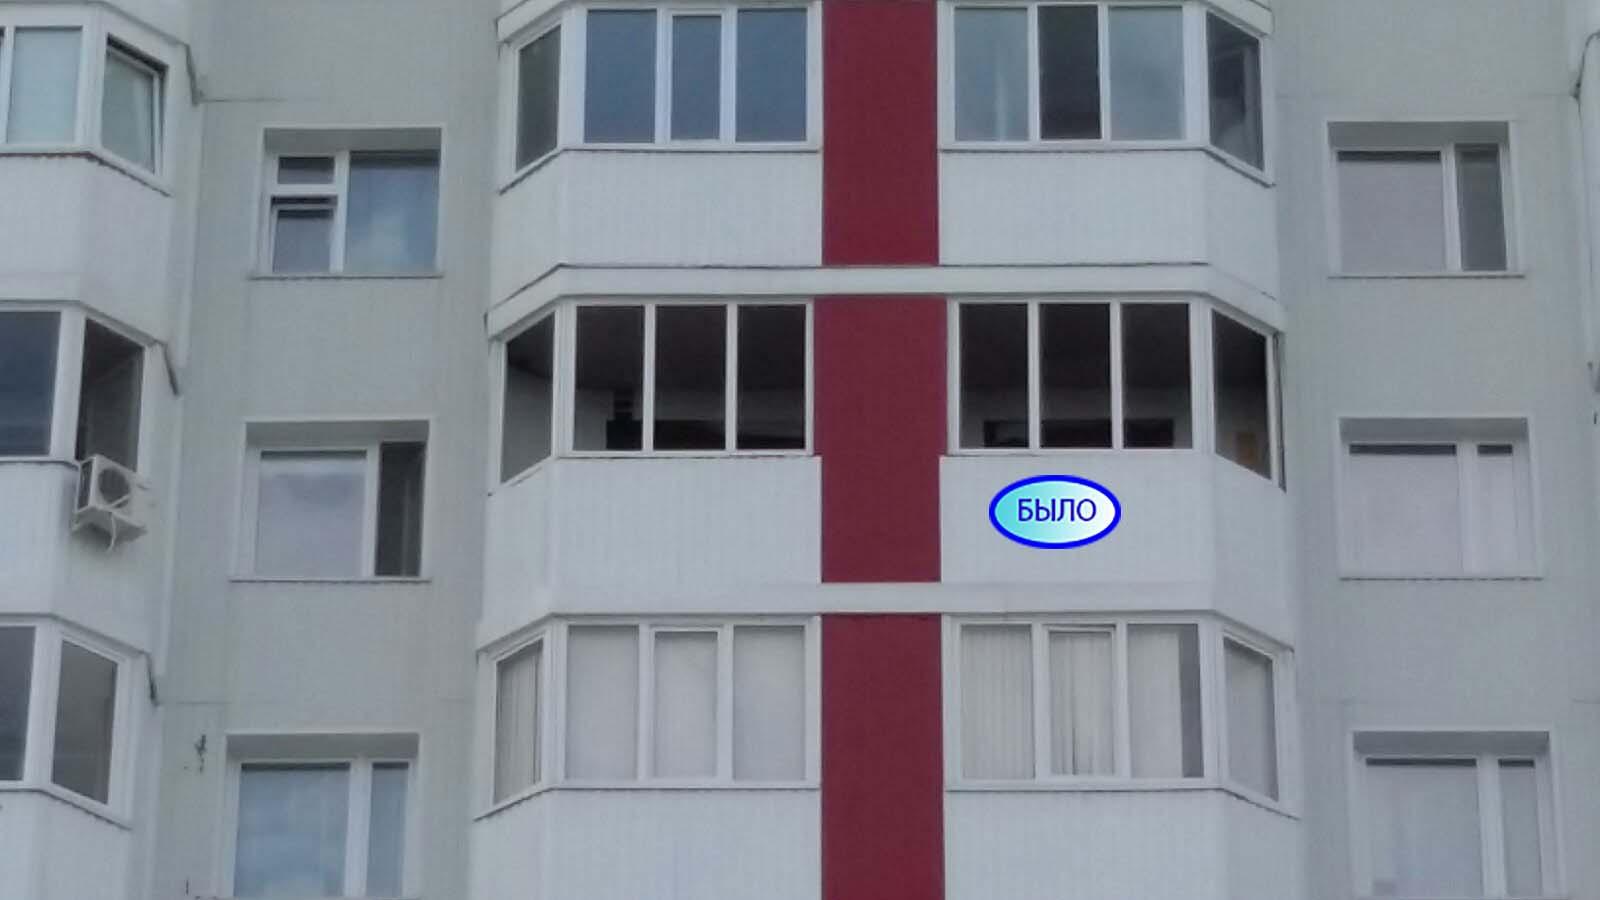 ул. Ивана Захарова 2/1 Установка пластиковых окон на балконе Фото 1